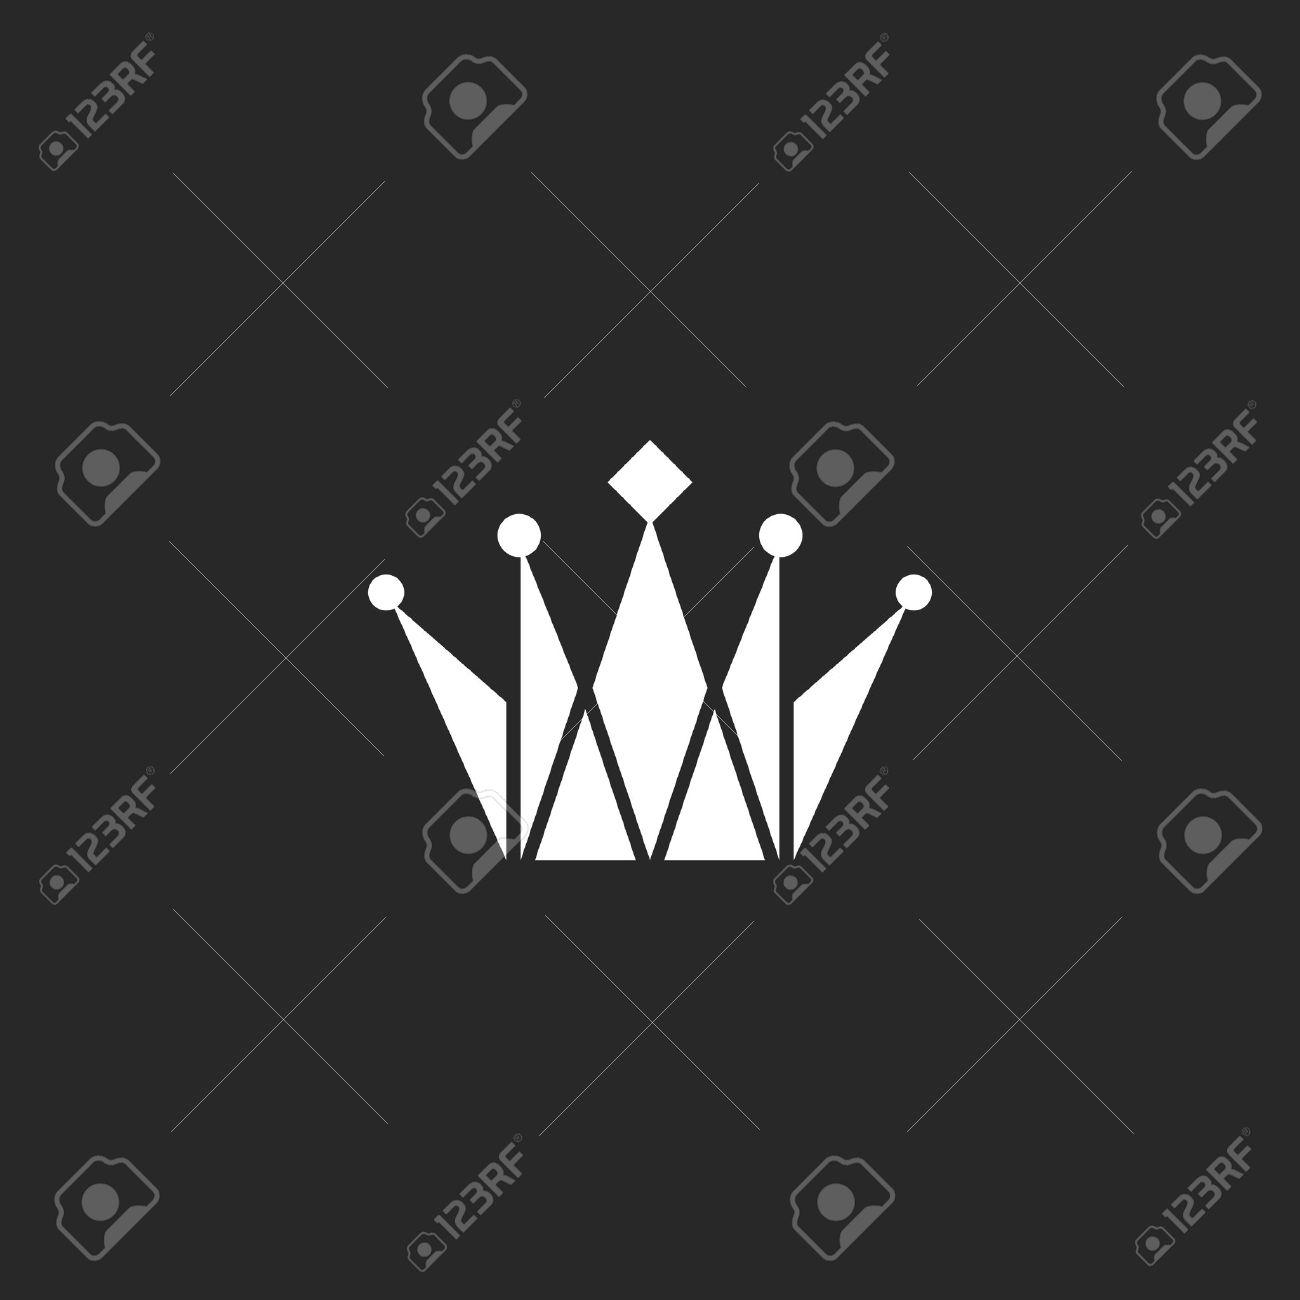 Crown Black And White Logo Royal Symbol Royalty Free Cliparts